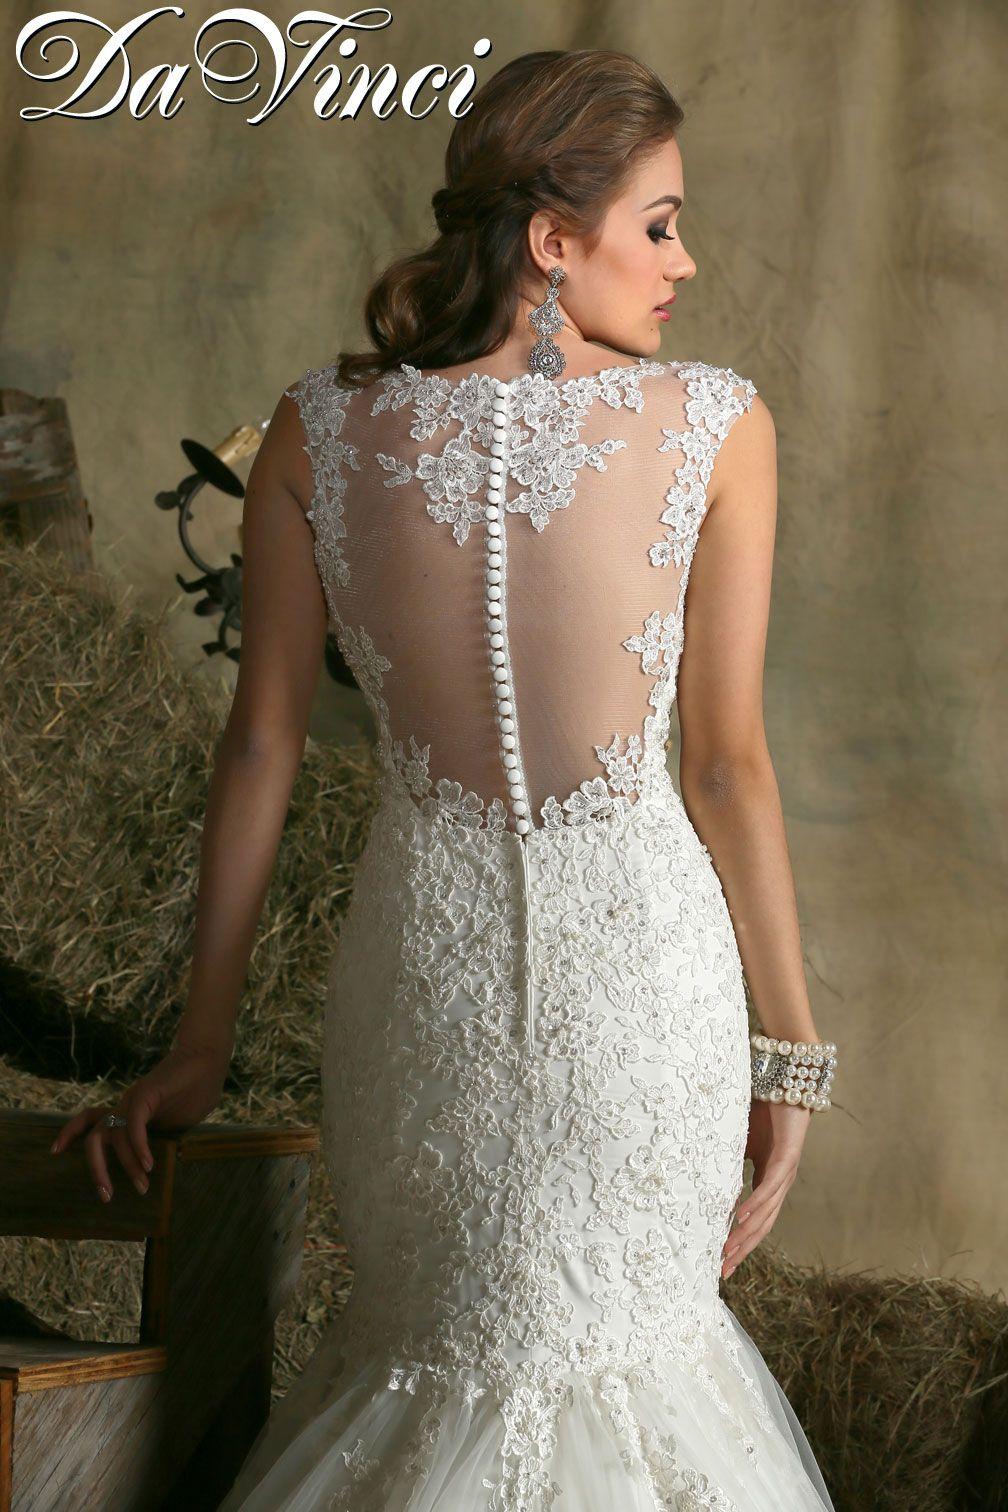 White mermaid wedding dress  DaVinci Style  is a lace and tulle mermaid wedding dress with